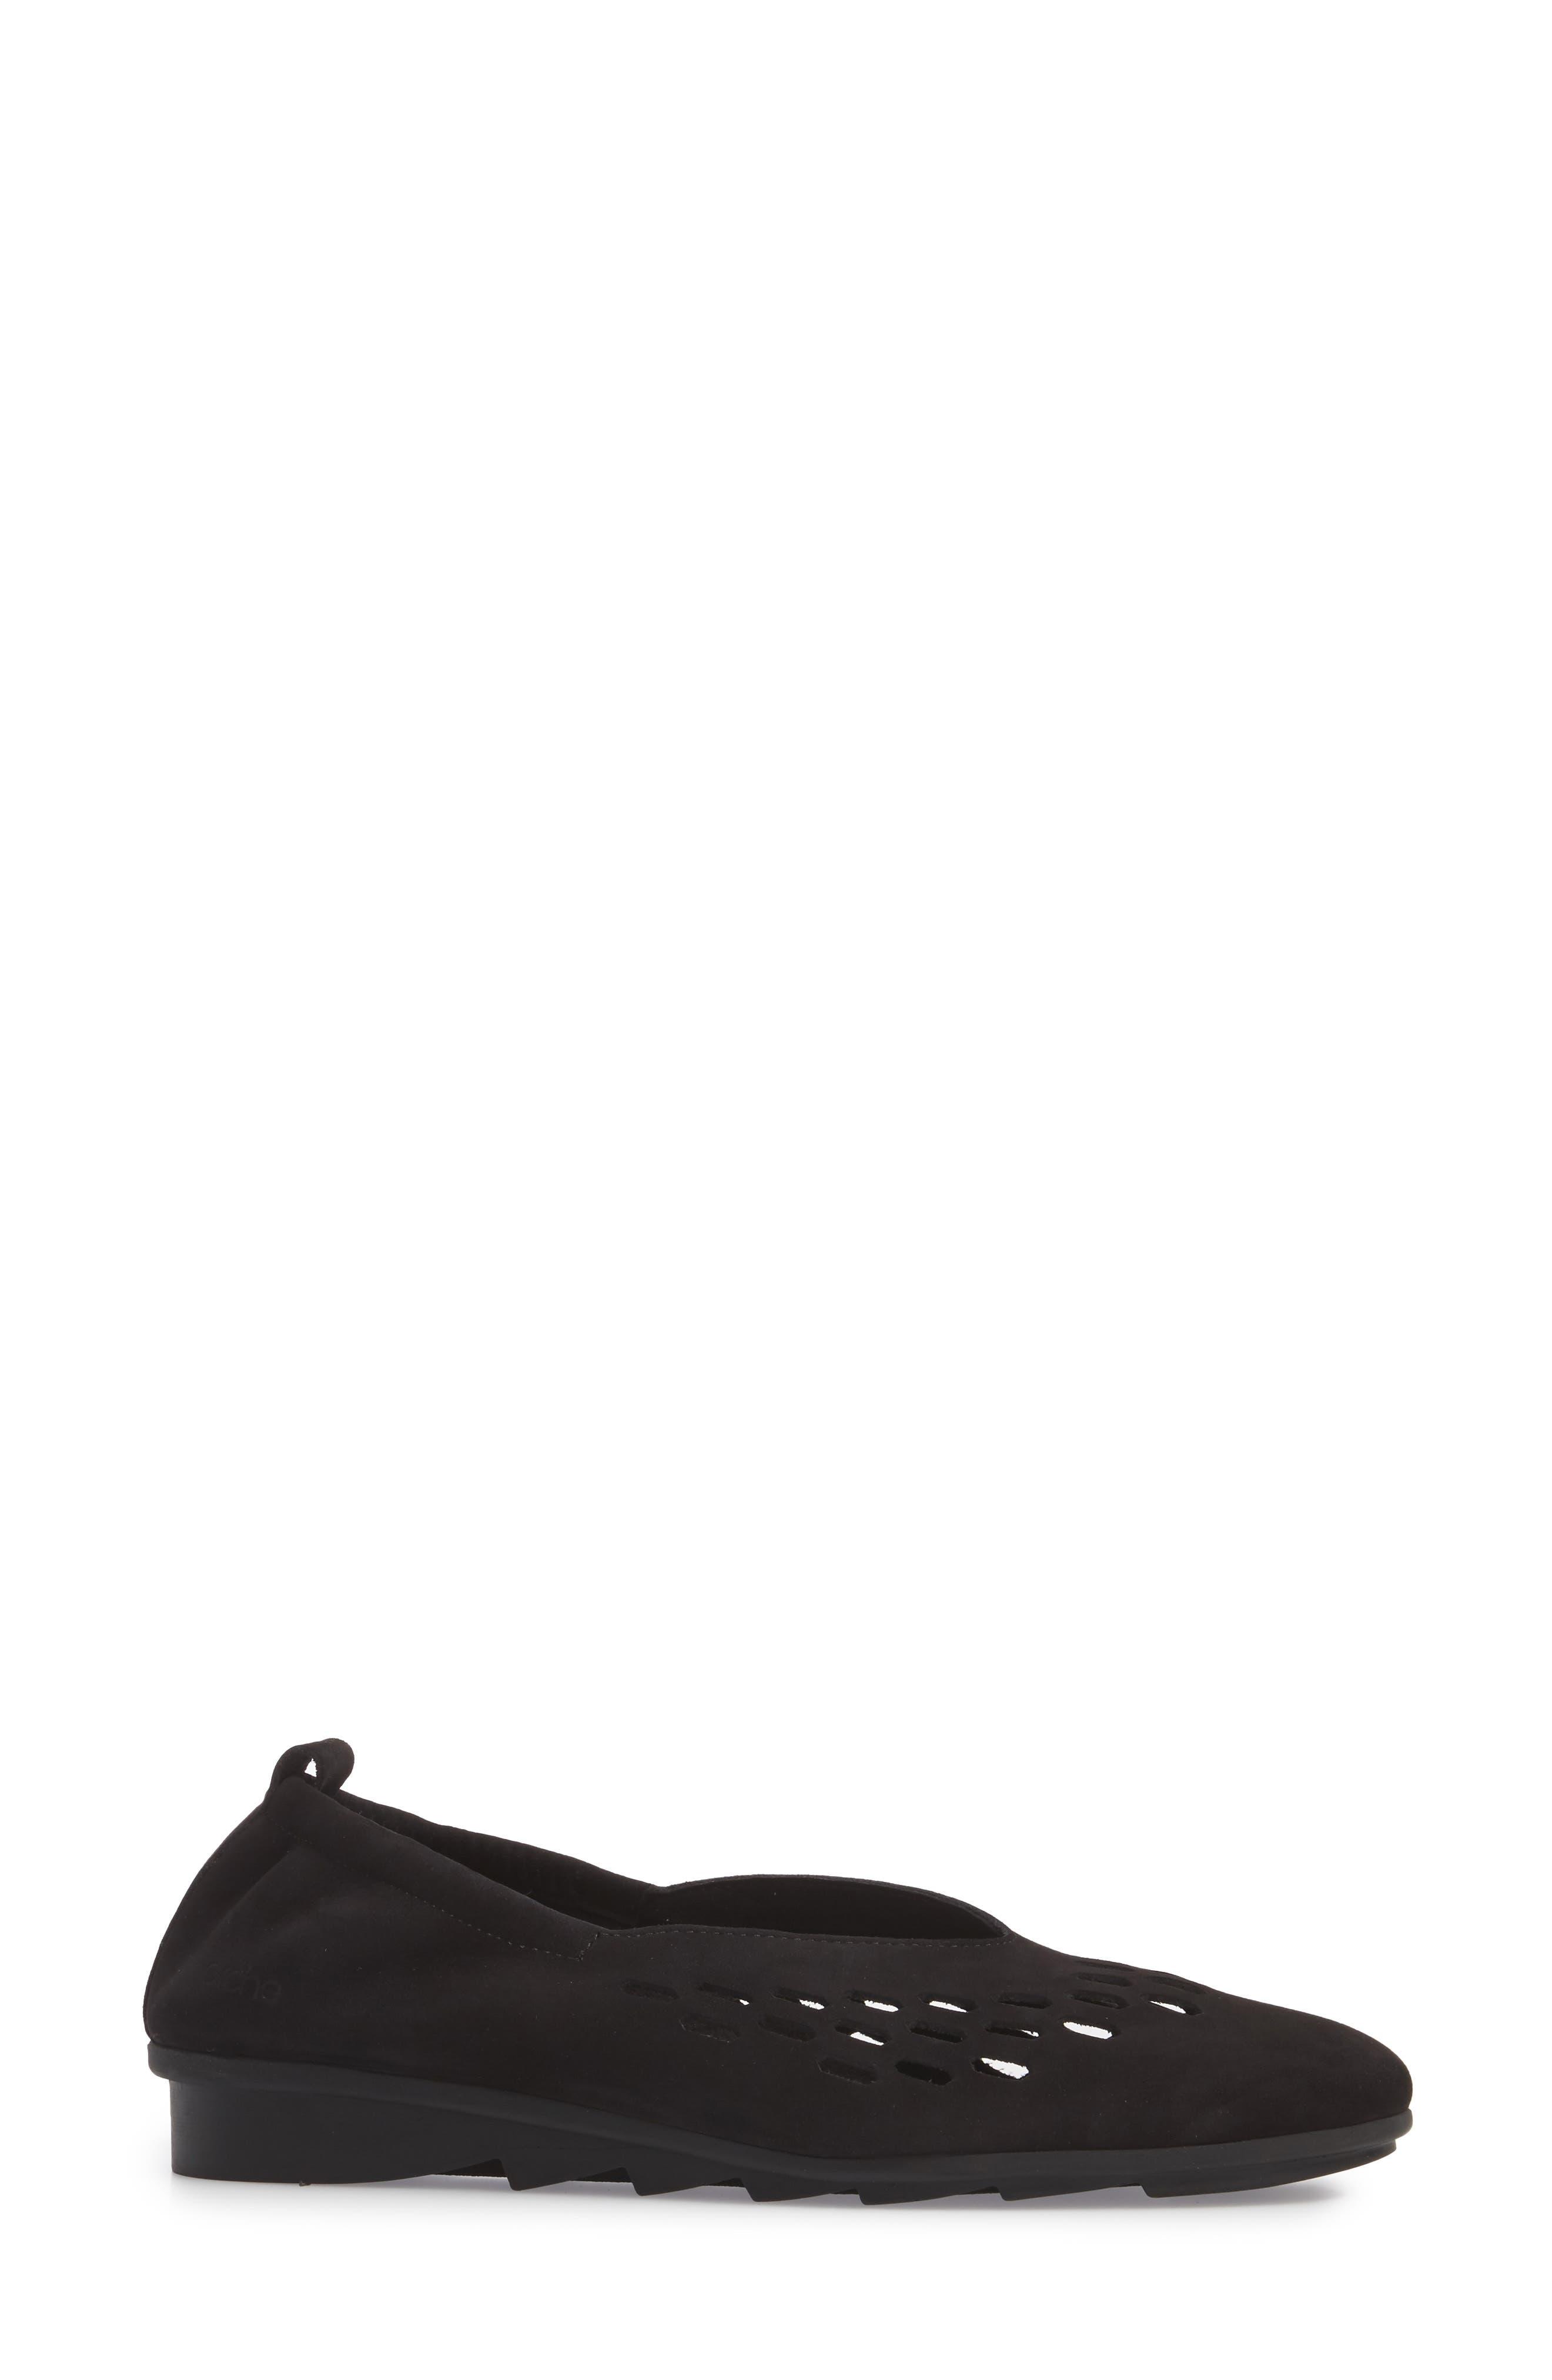 Bibiza Flat,                             Alternate thumbnail 3, color,                             Noir Nubuck Leather